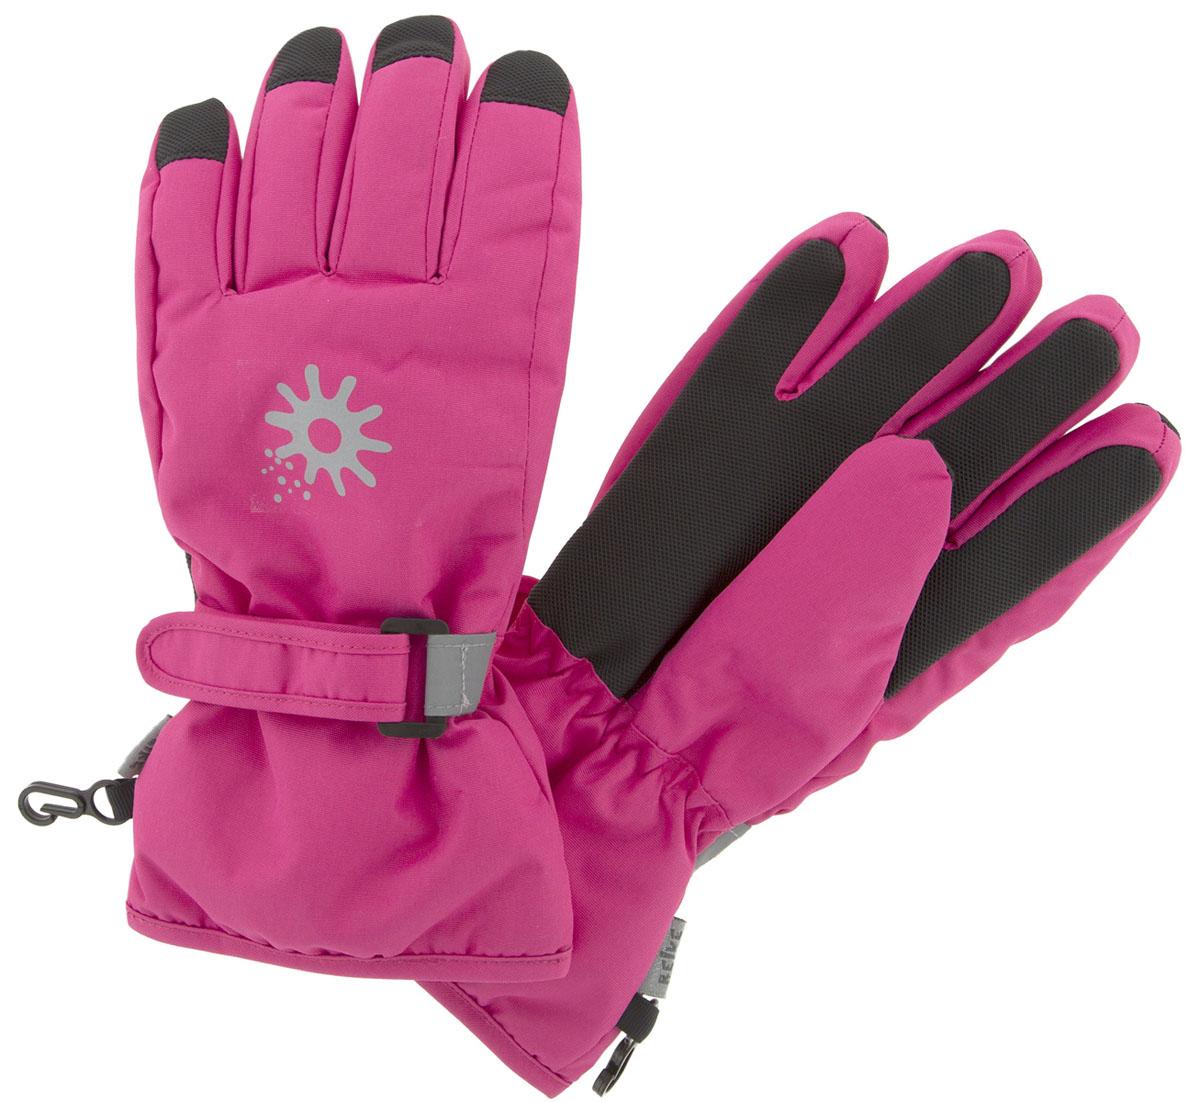 Перчатки для девочки Reike Зимние звезды, цвет: фуксия. RW18_WSR fuchsia. Размер 8 перчатки reike